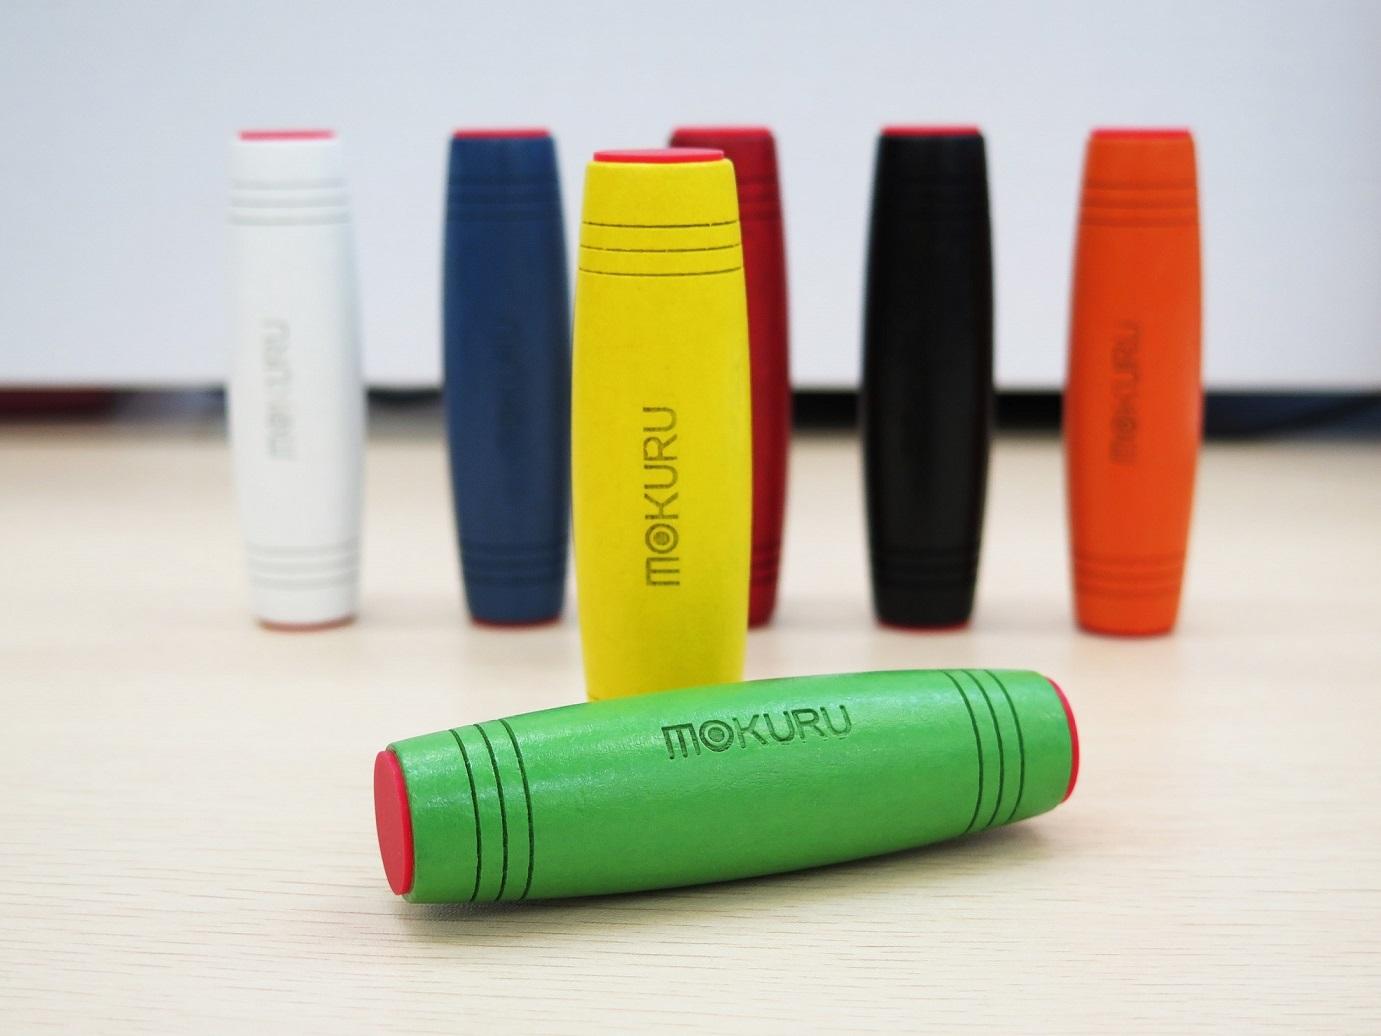 Mokuru; barevné varianty